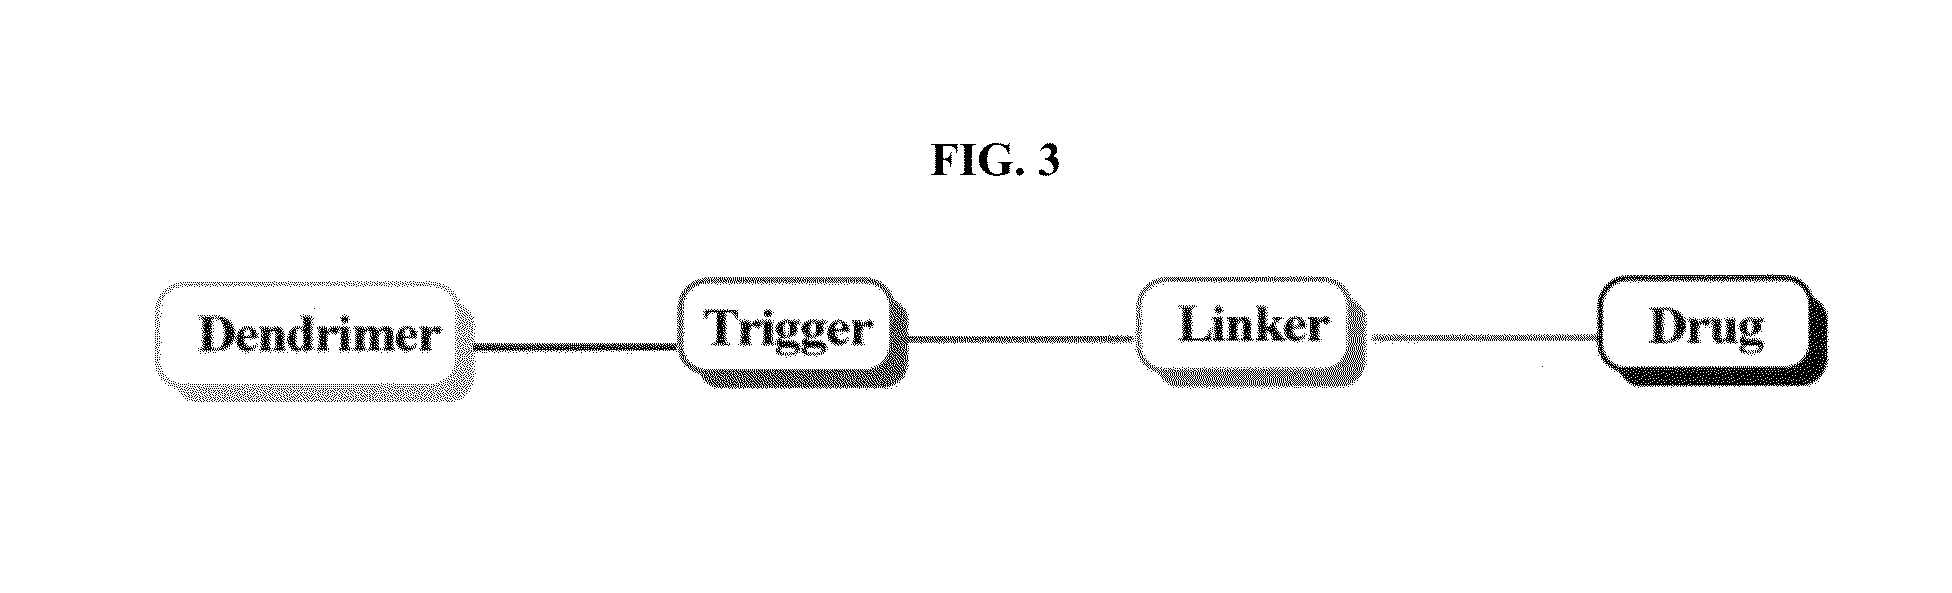 Patent Us 8980907 B2 Horton Ambulance Wiring Diagram Images